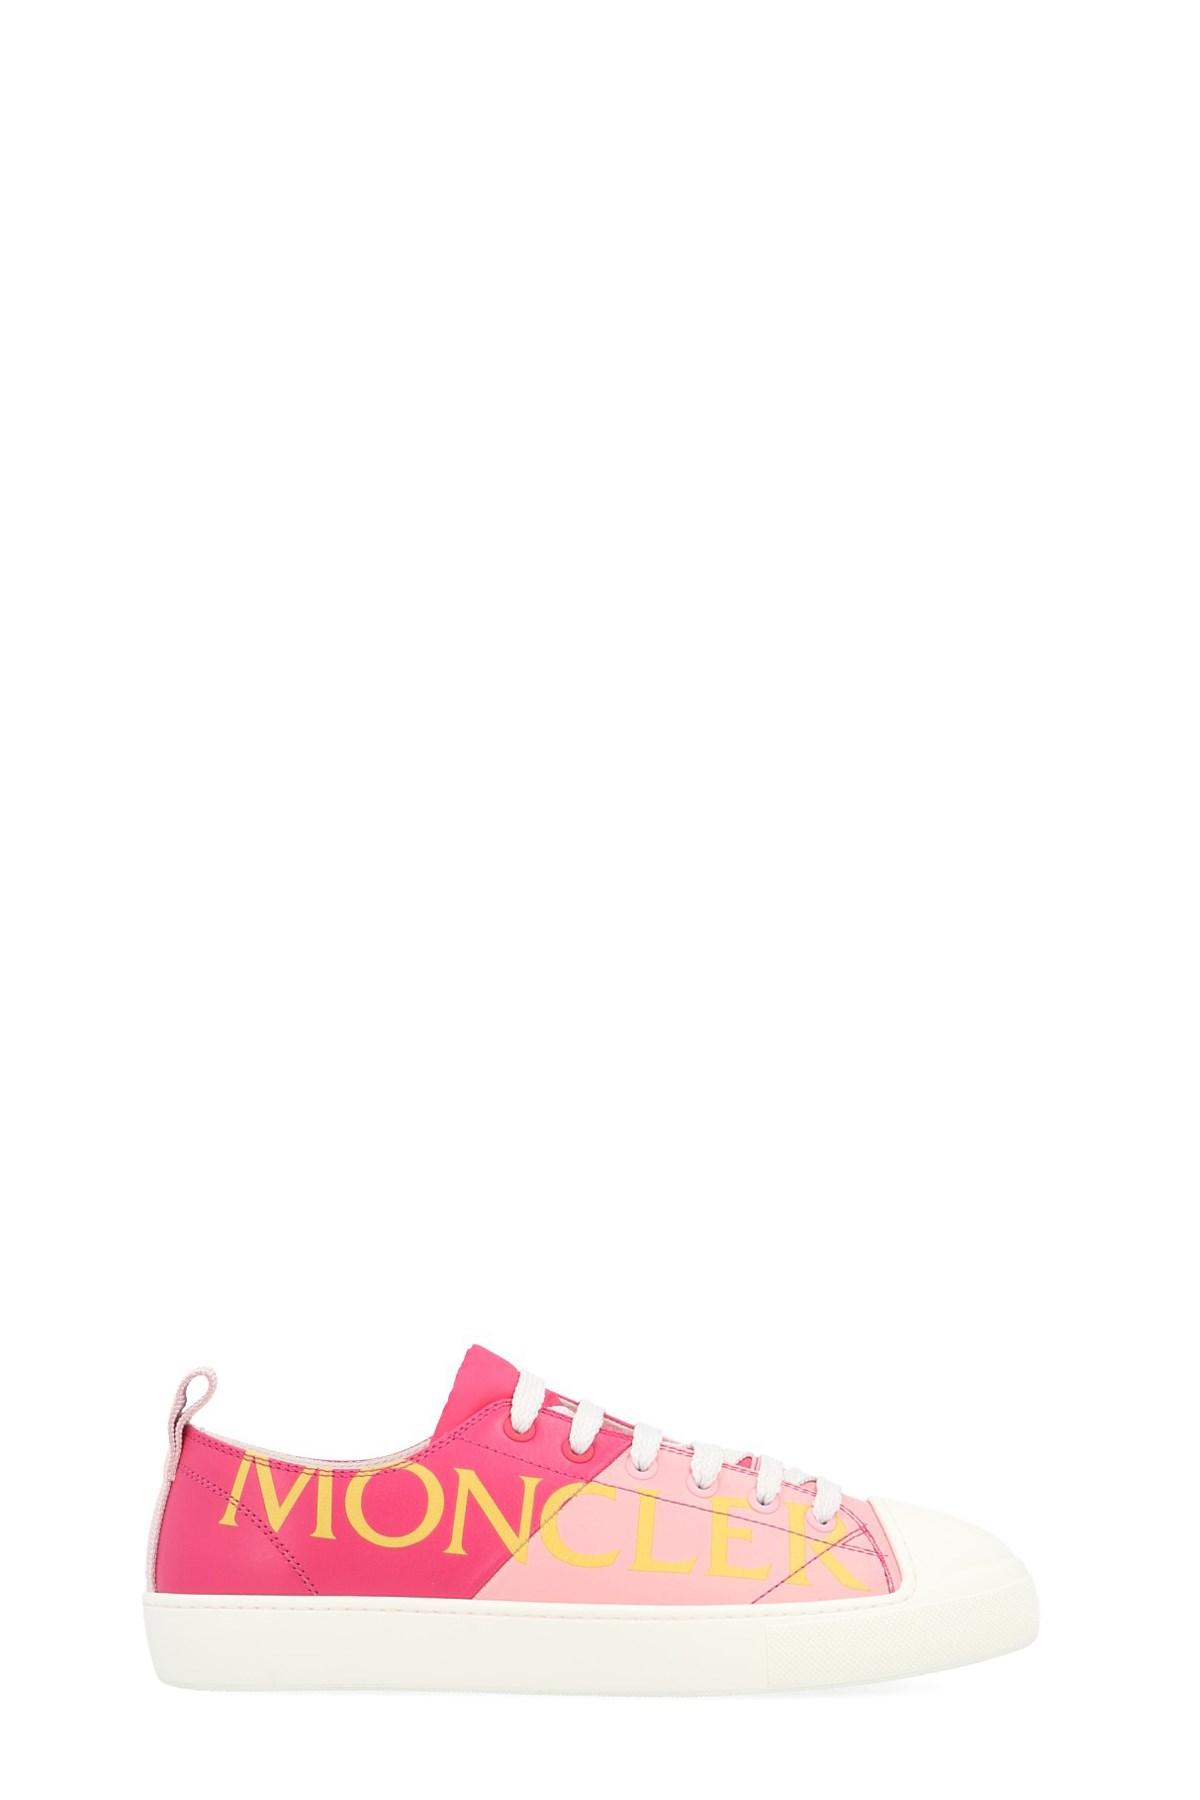 3c1ce029b93 moncler 'Linda' sneakers available on julian-fashion.com - 67574